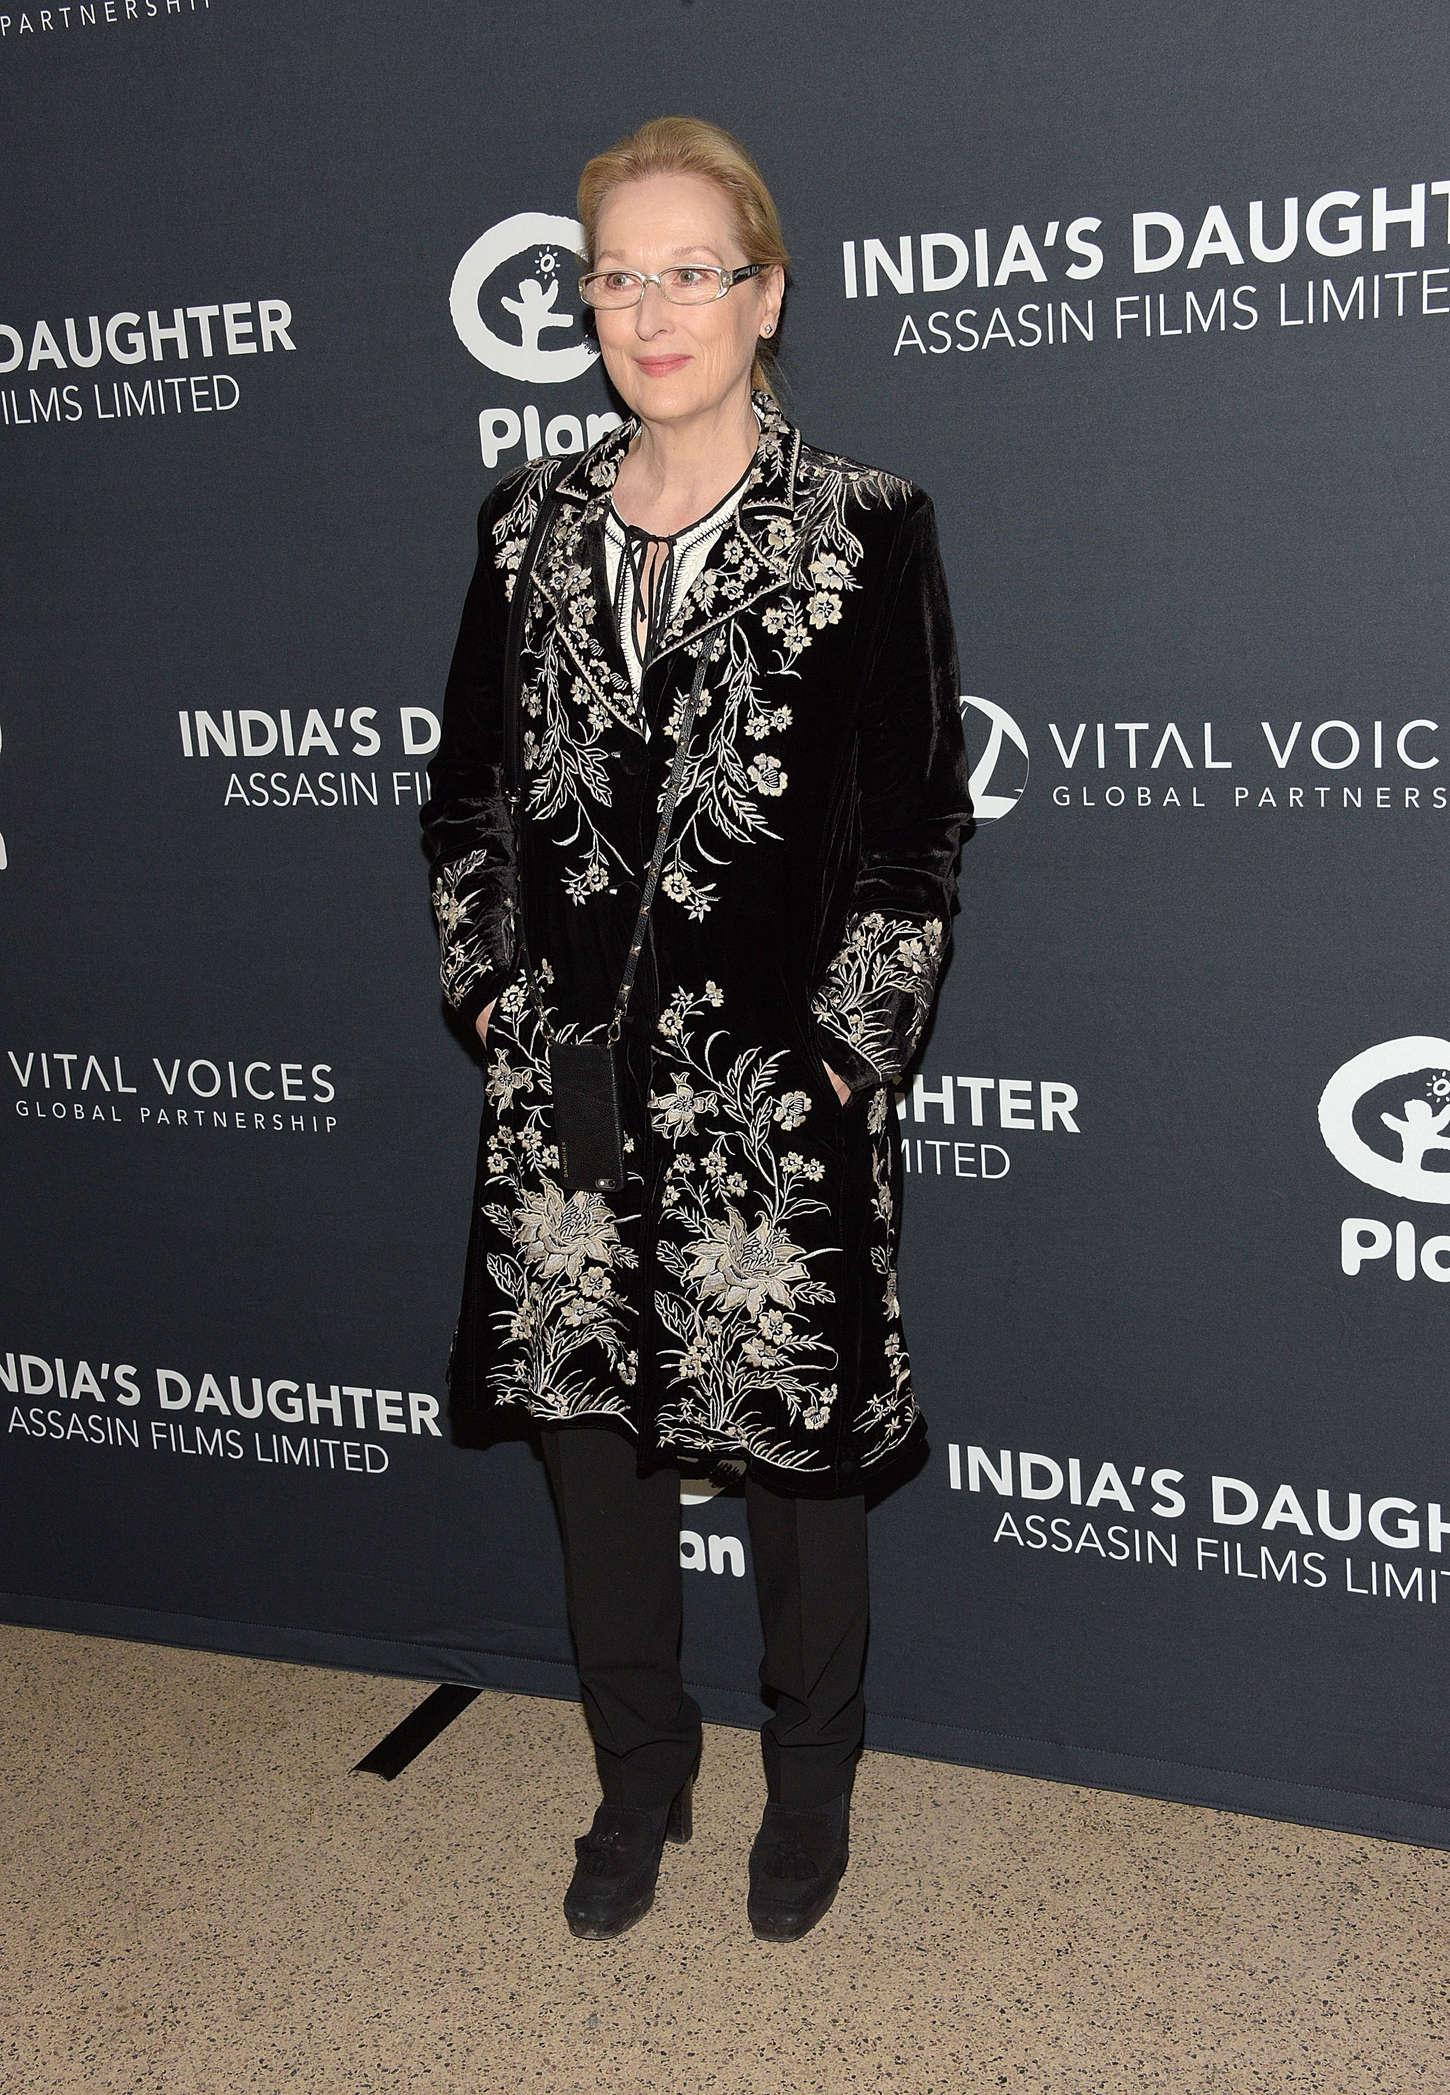 Meryl Streep Indias Daughter Screening in New York